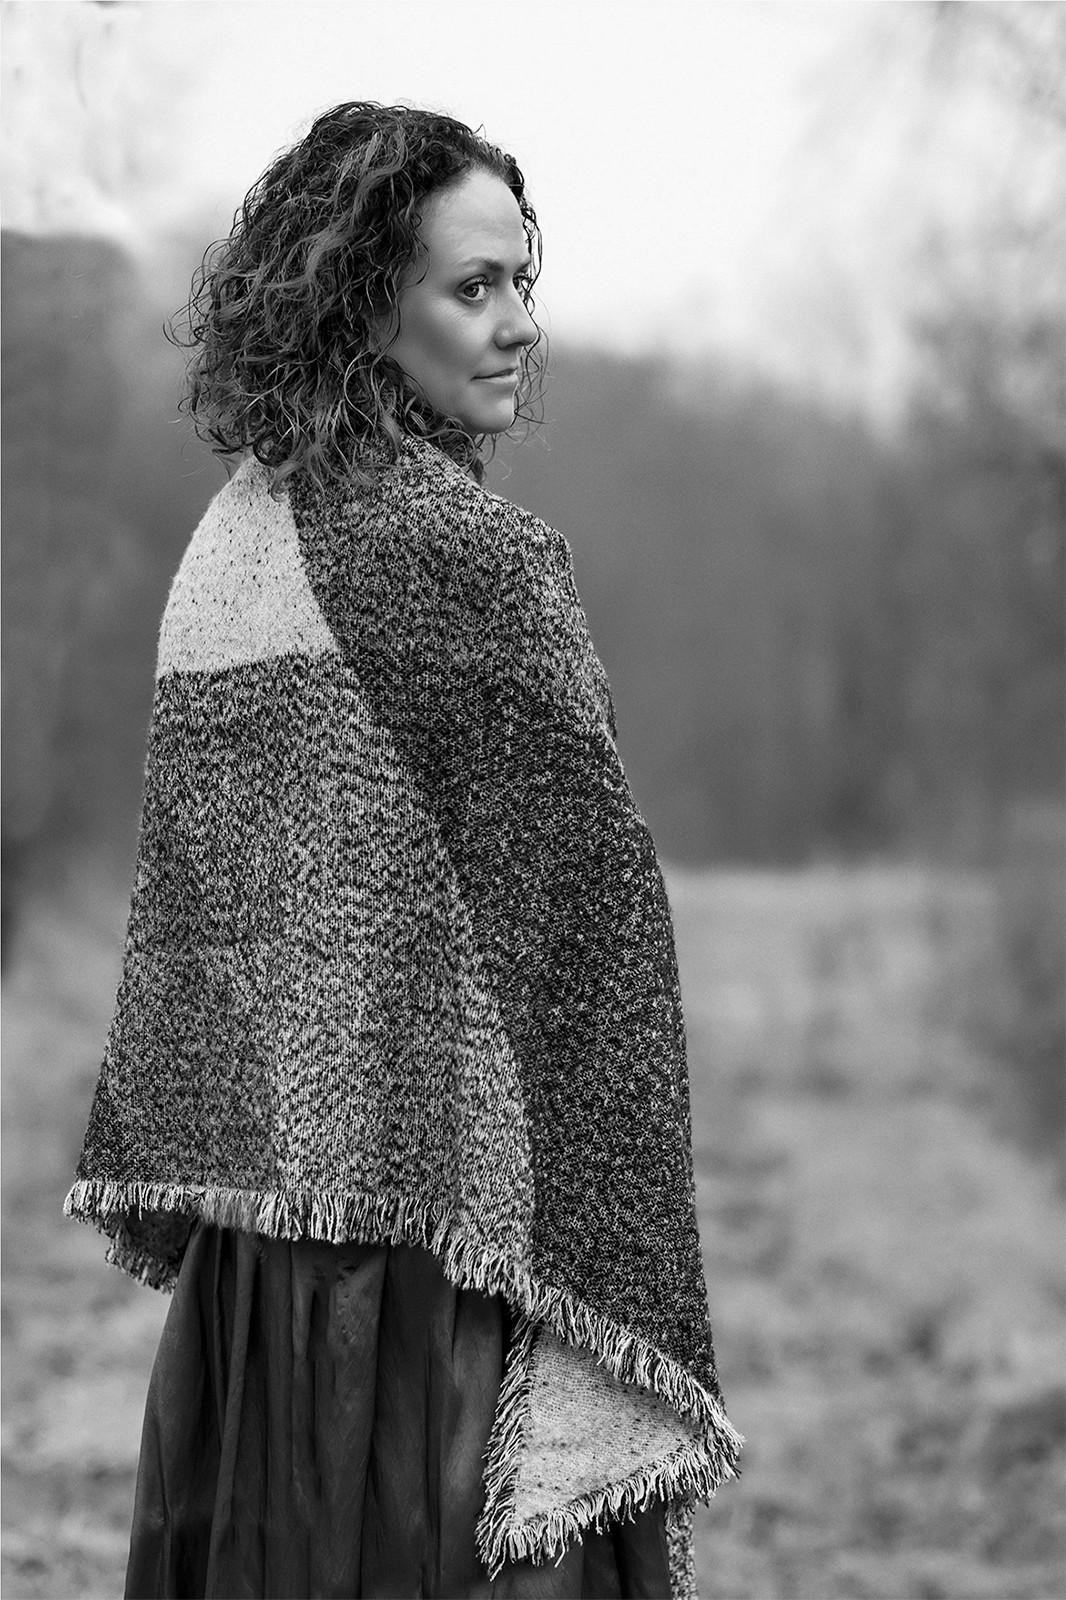 MONO - The Galway Shawl - Bridget Kealey by Dympna Heagney (10 marks)